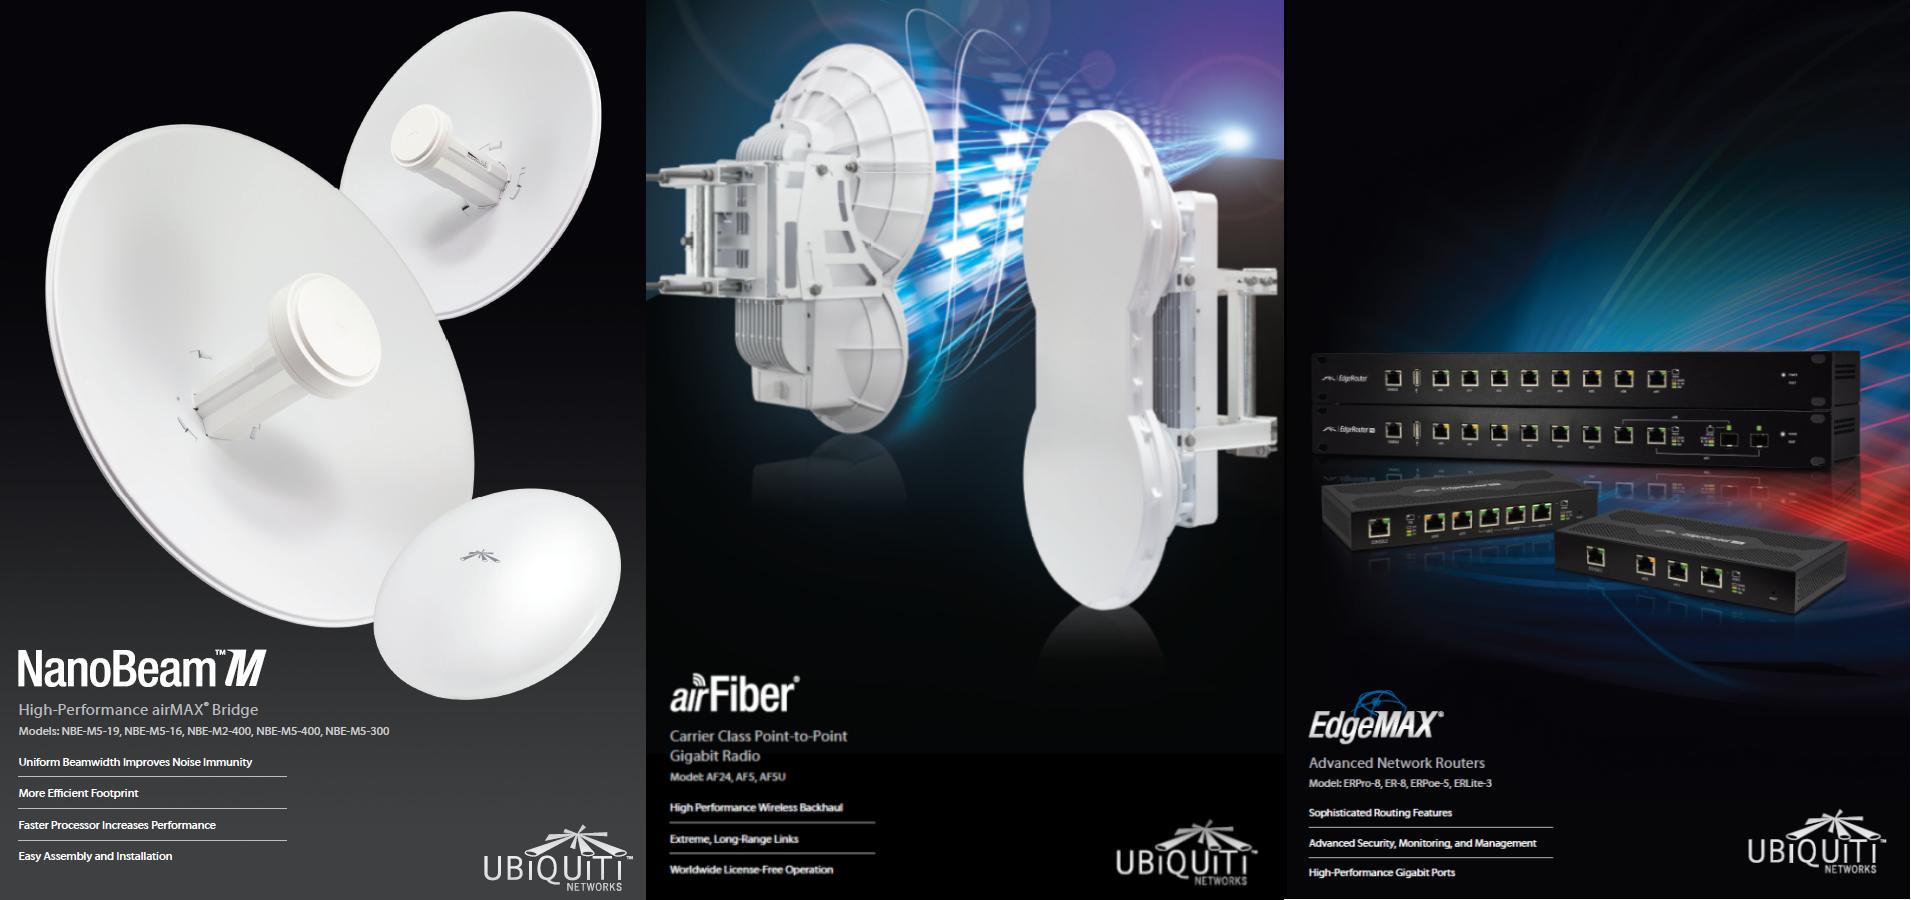 Wireless Internet Service Provider >> Ubiquiti Networks Introduces Next-Gen Fixed Wireless Broadband Infrastructure